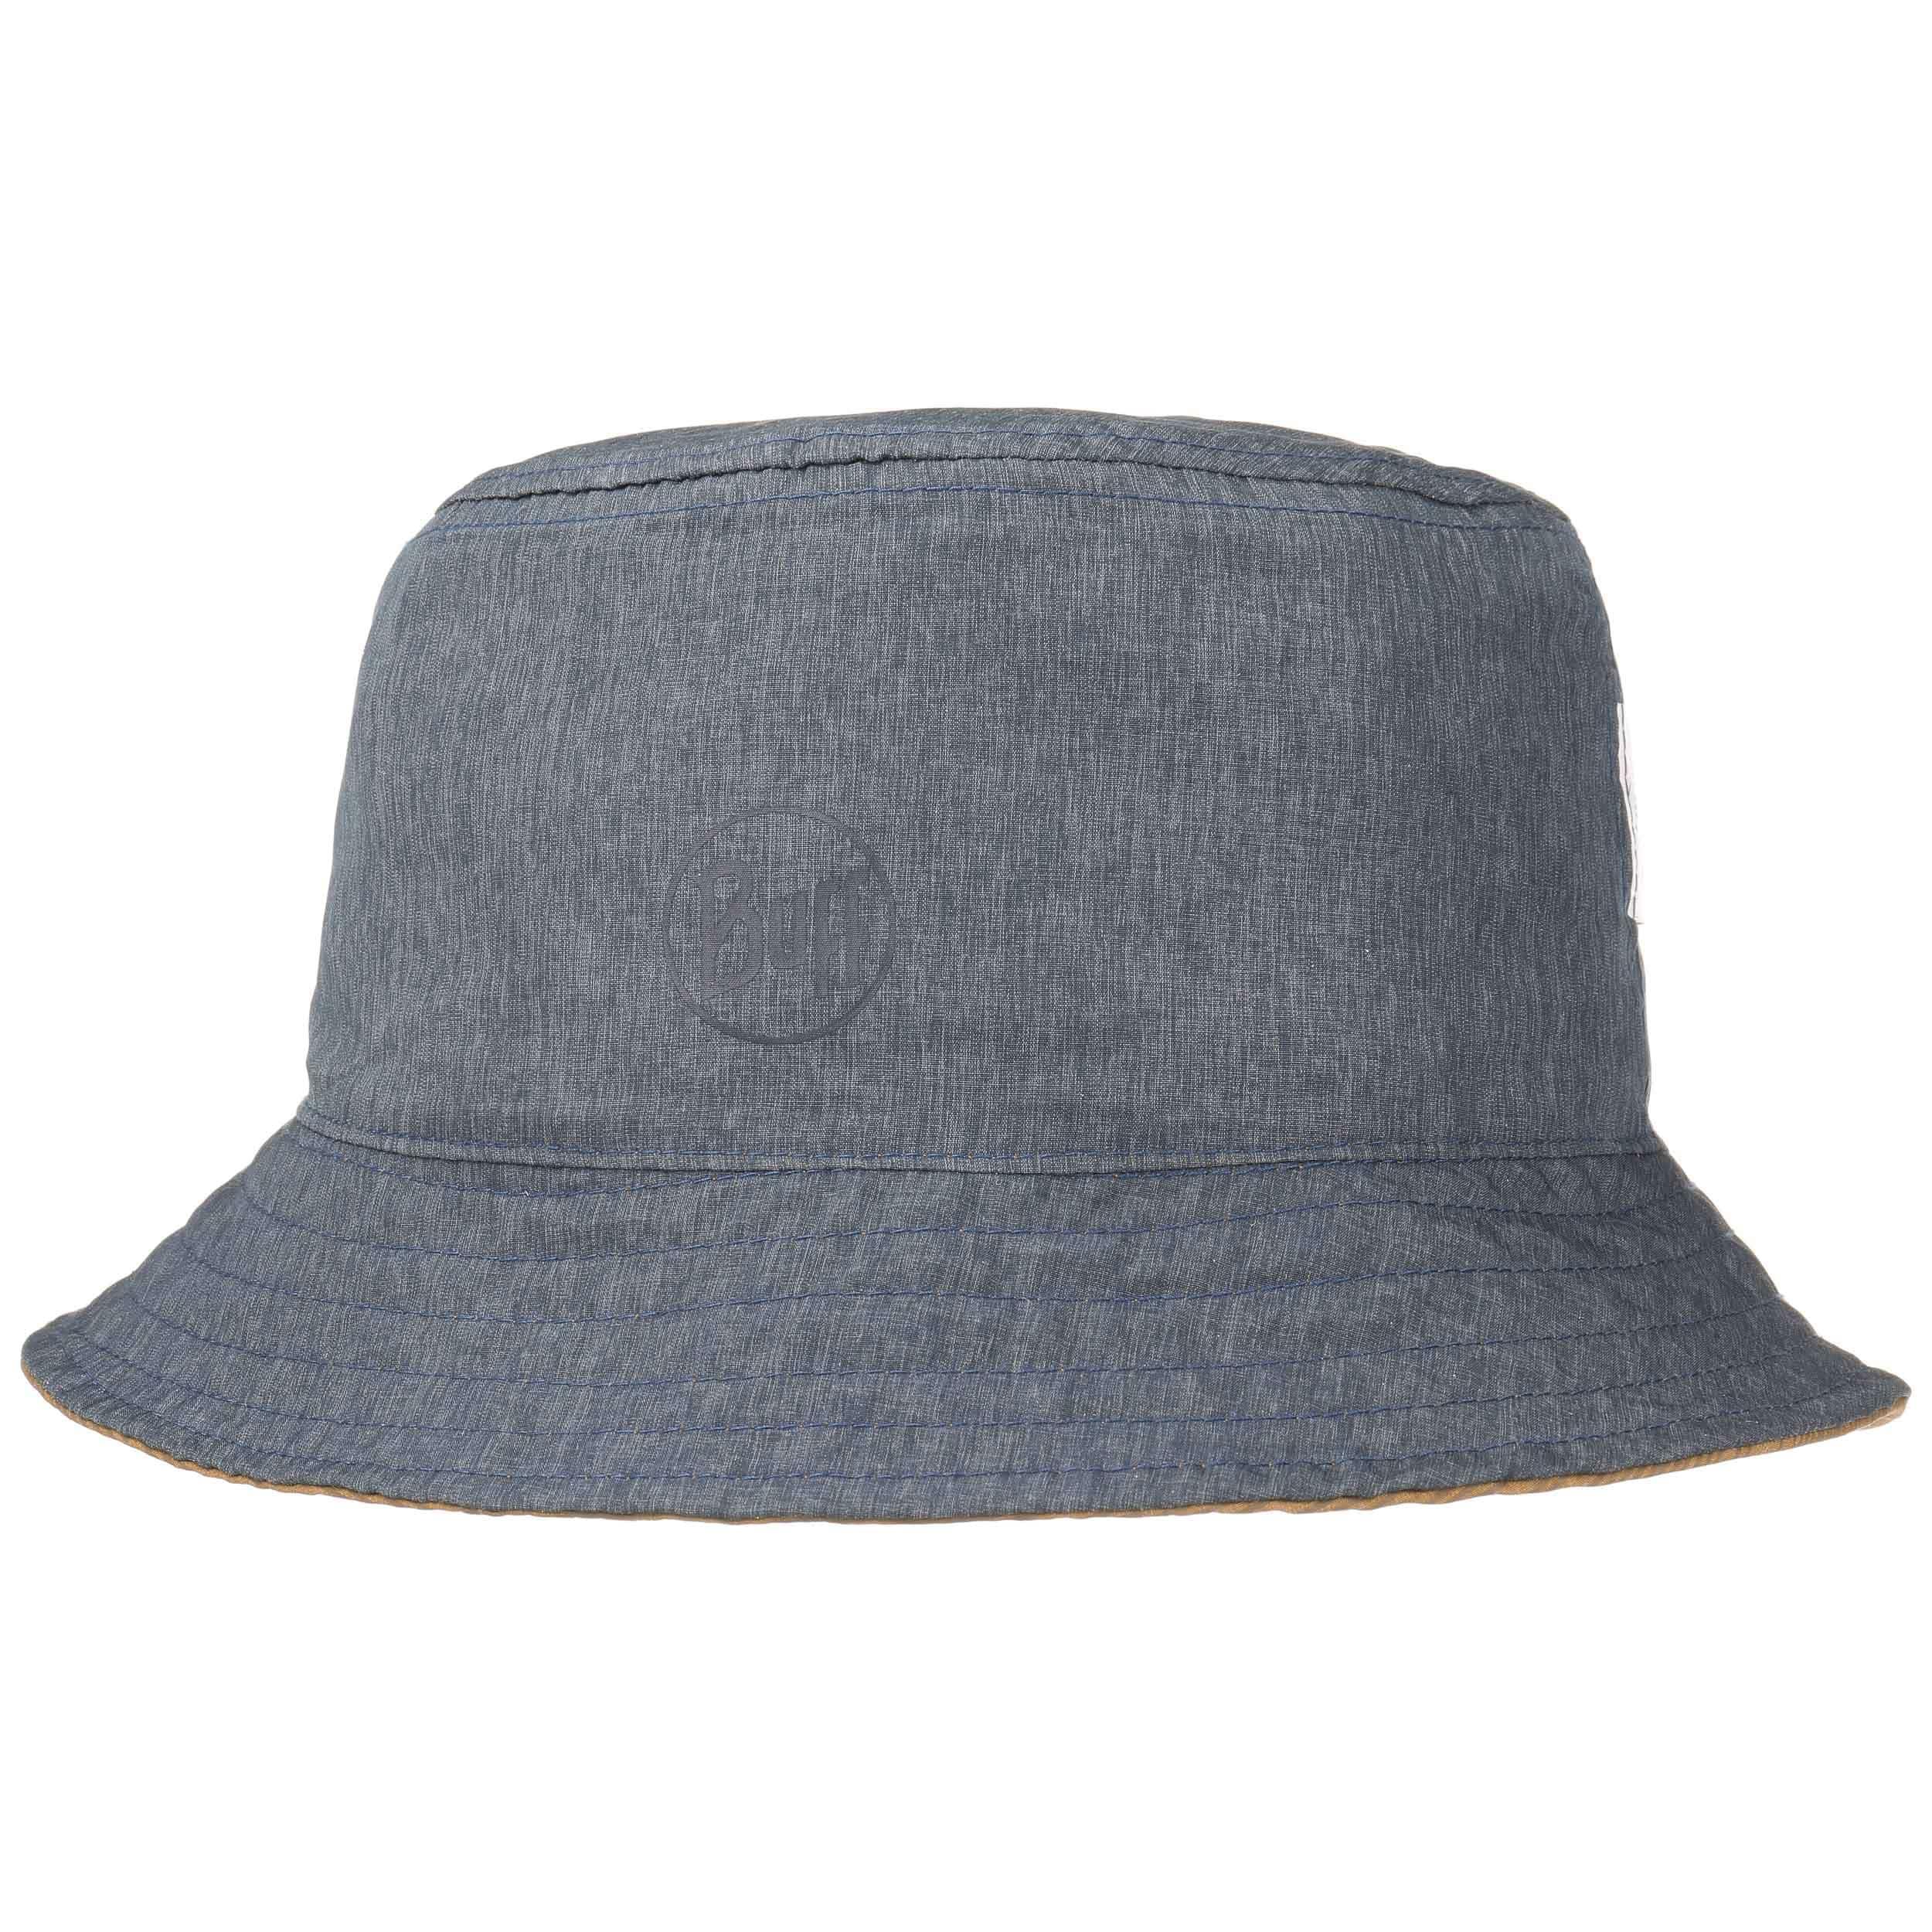 ... Landscape Reversible Fishing Hat by BUFF - navy 6 ... 0970f6b7e